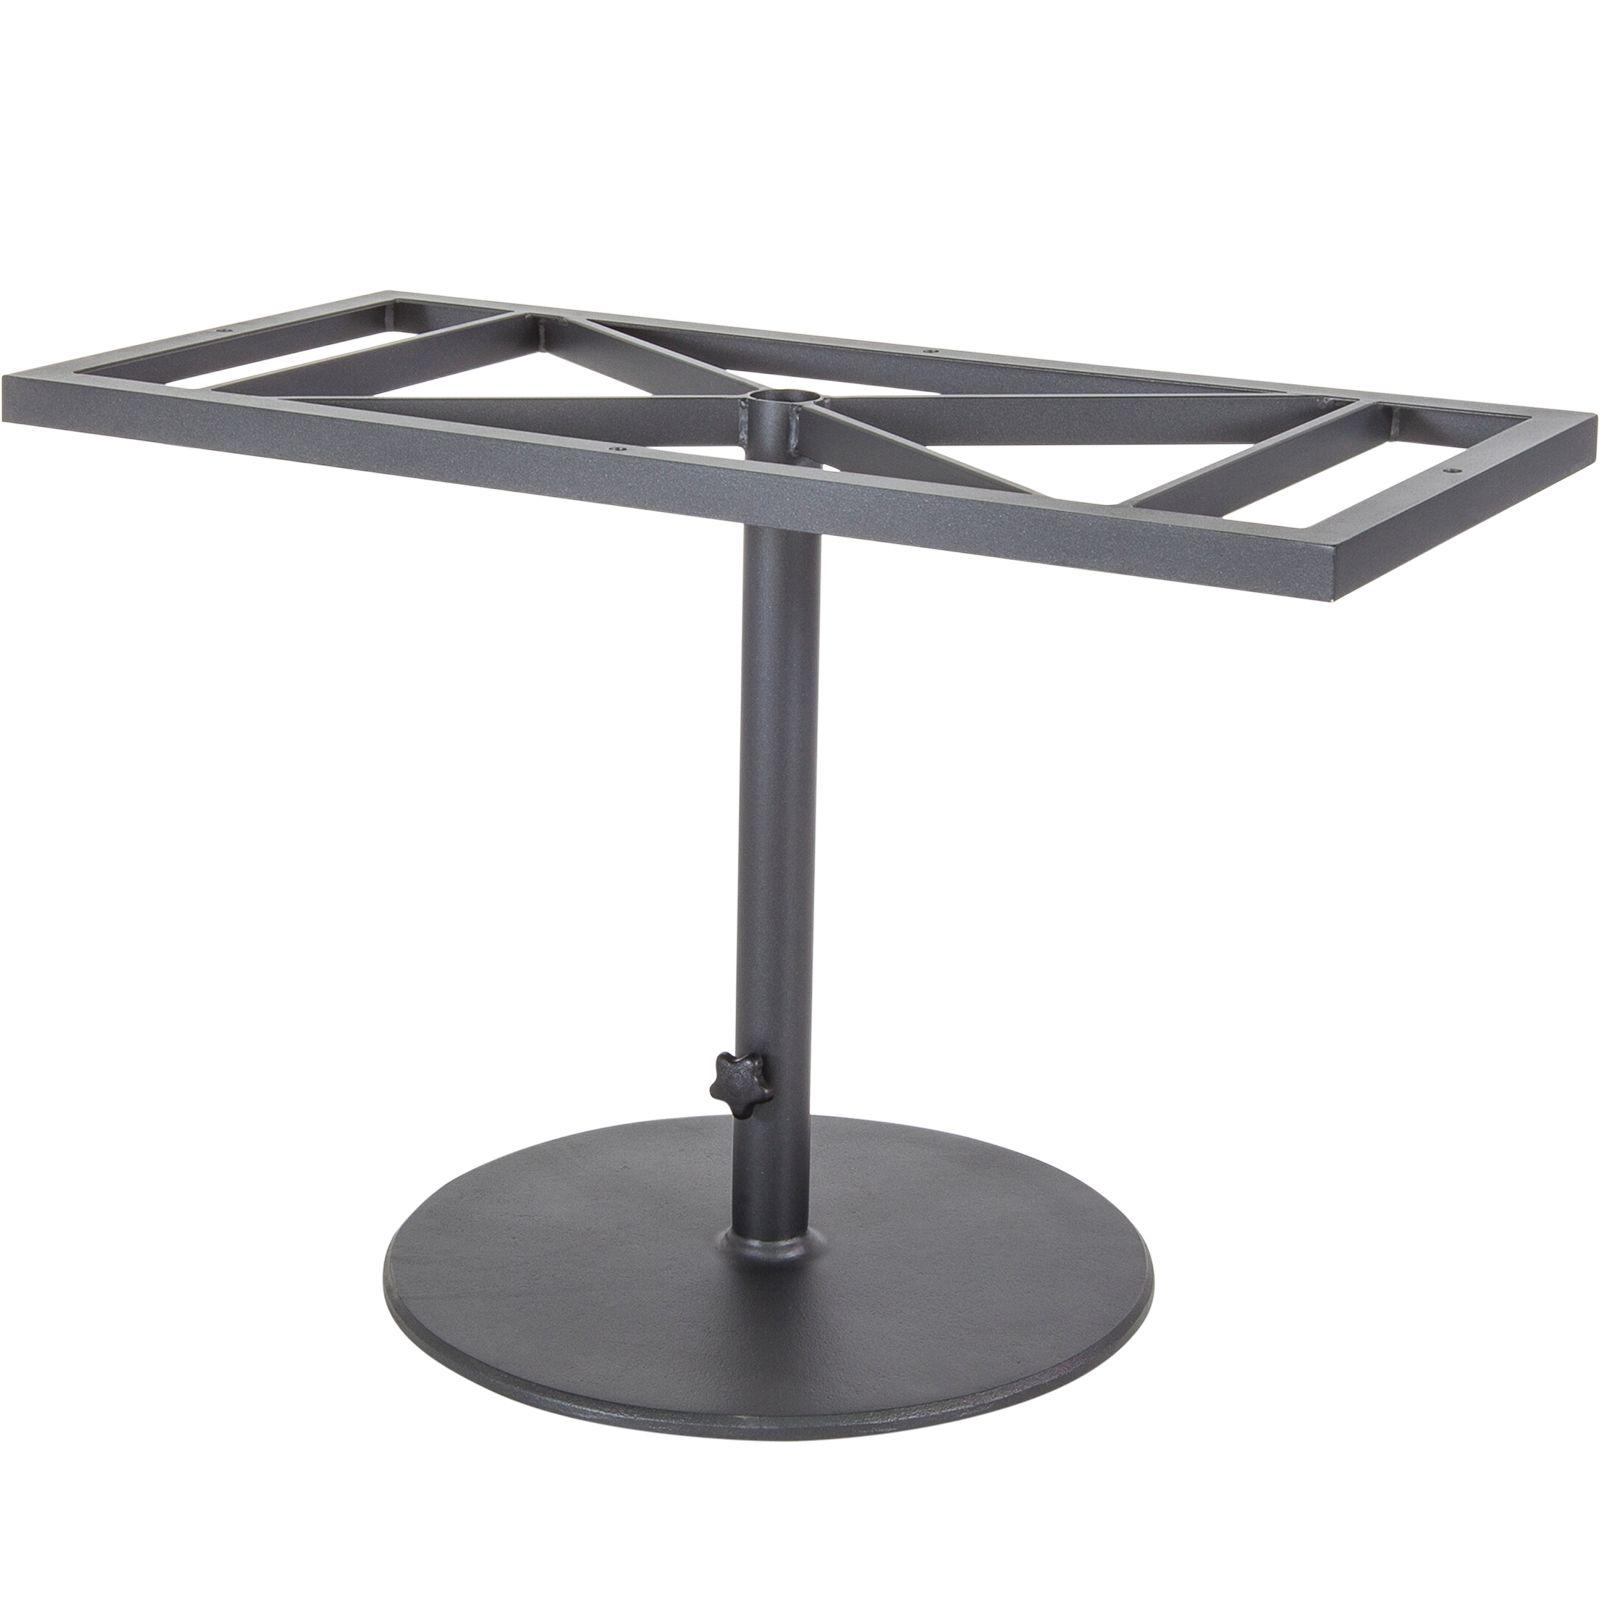 Lennox 05 Dining Table Base